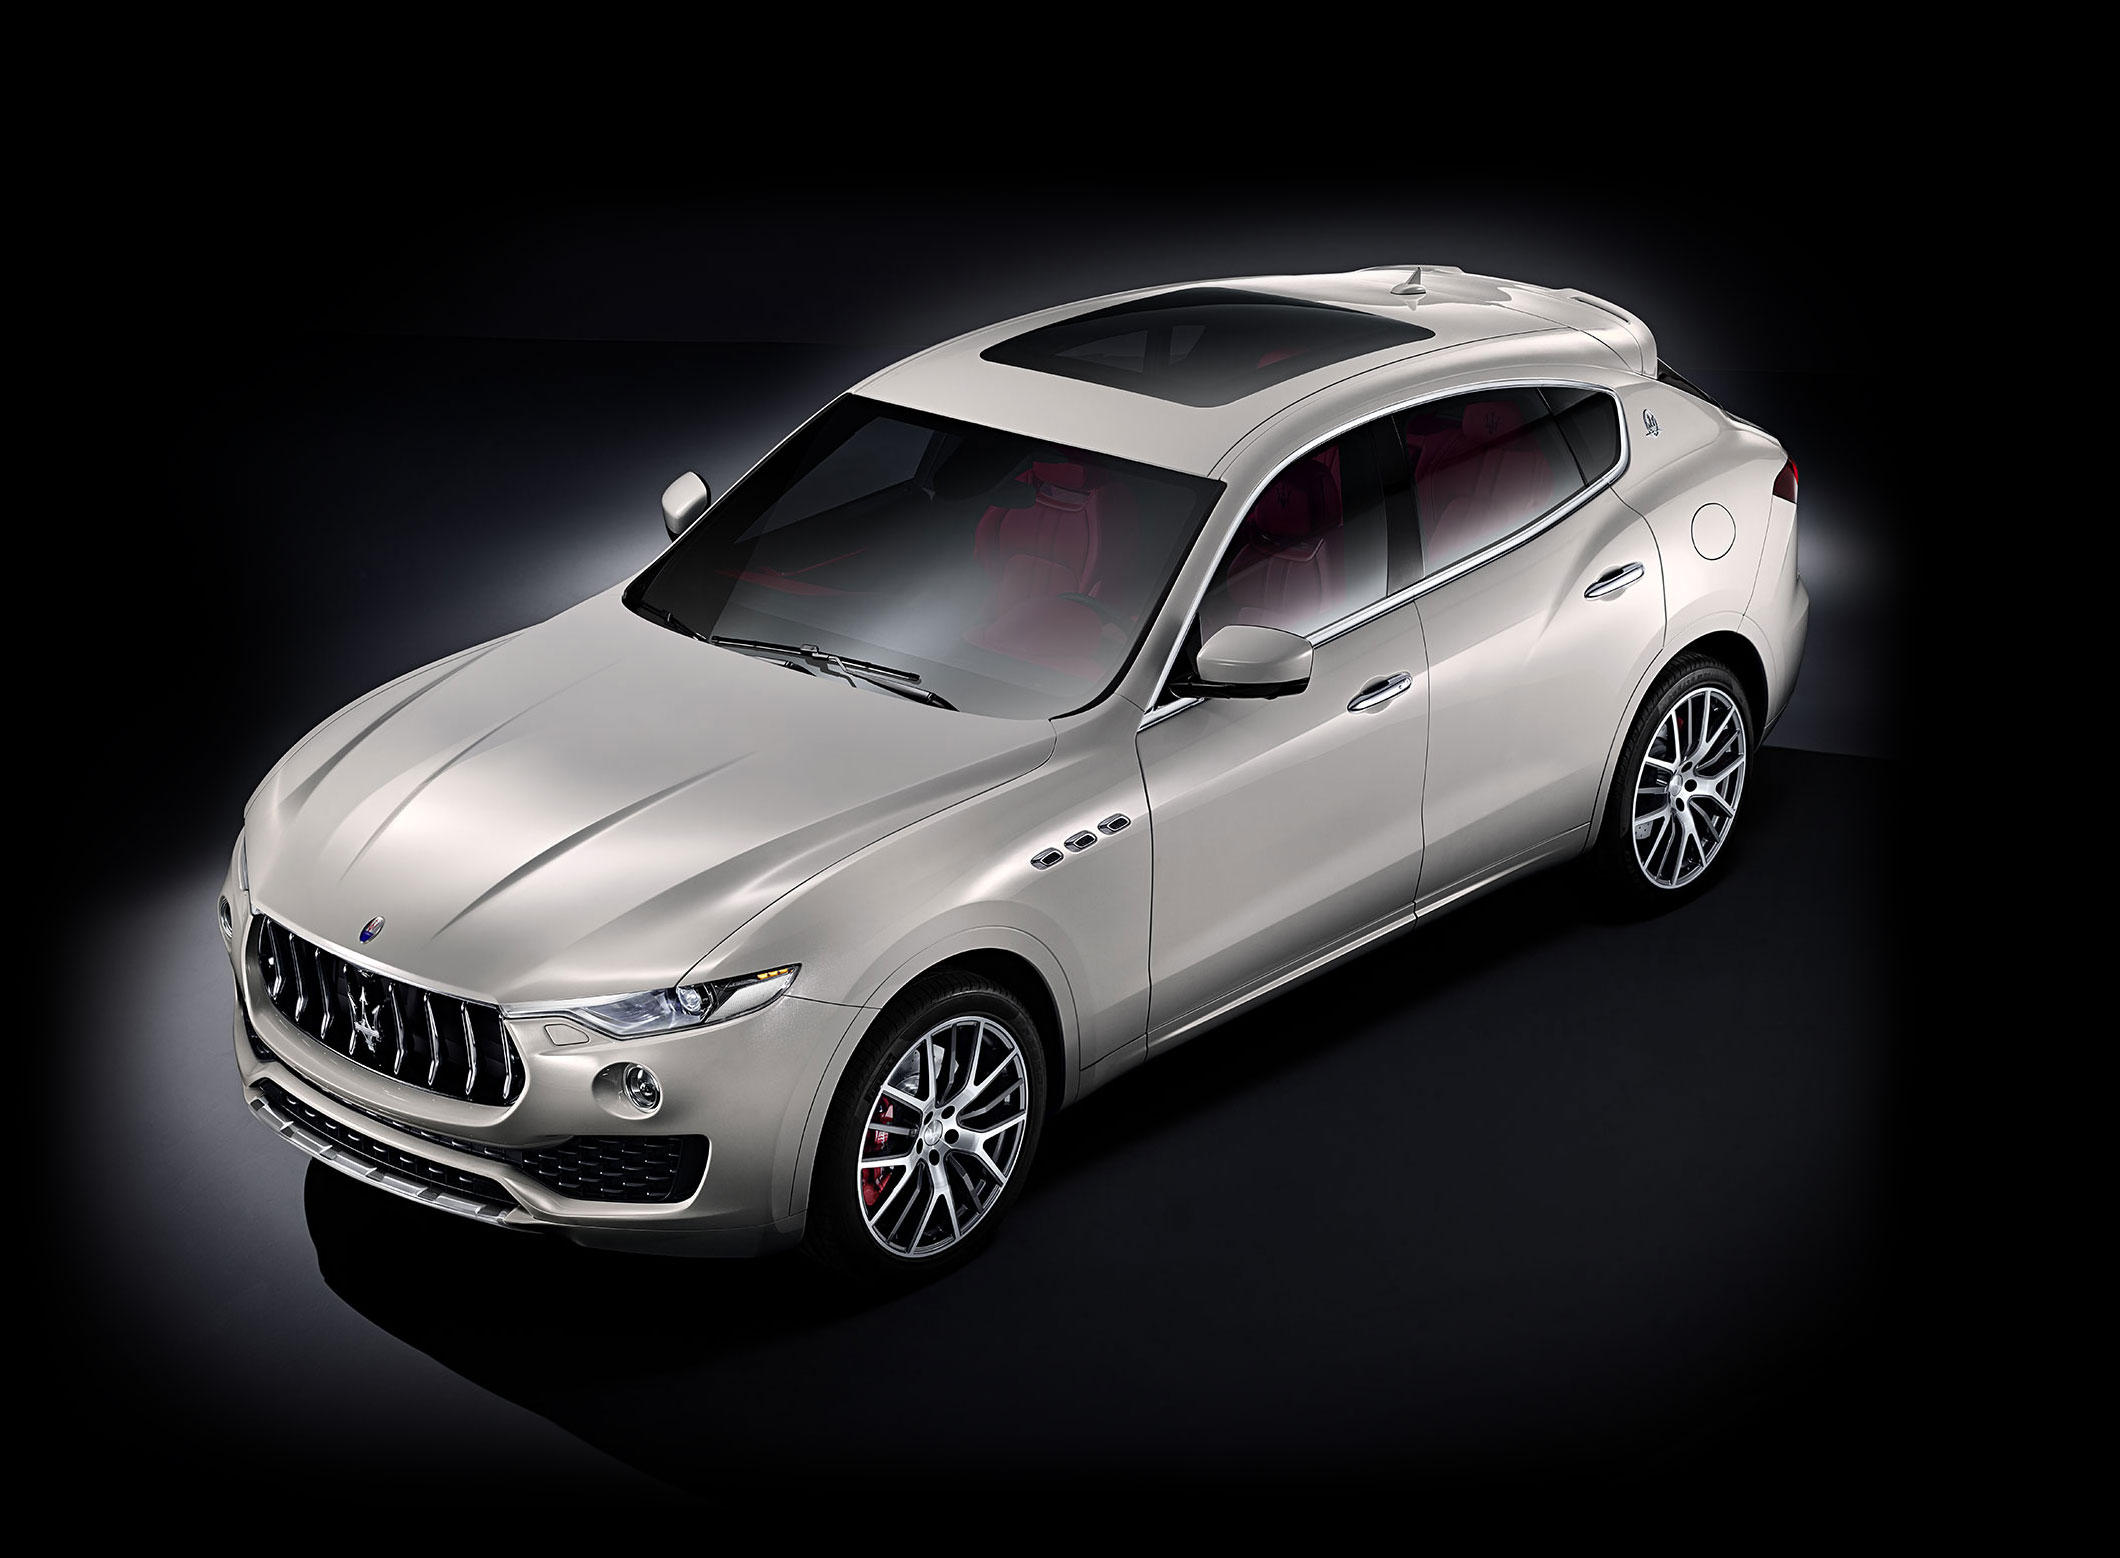 Maserati Levante. (Photo courtesy of Maserati)